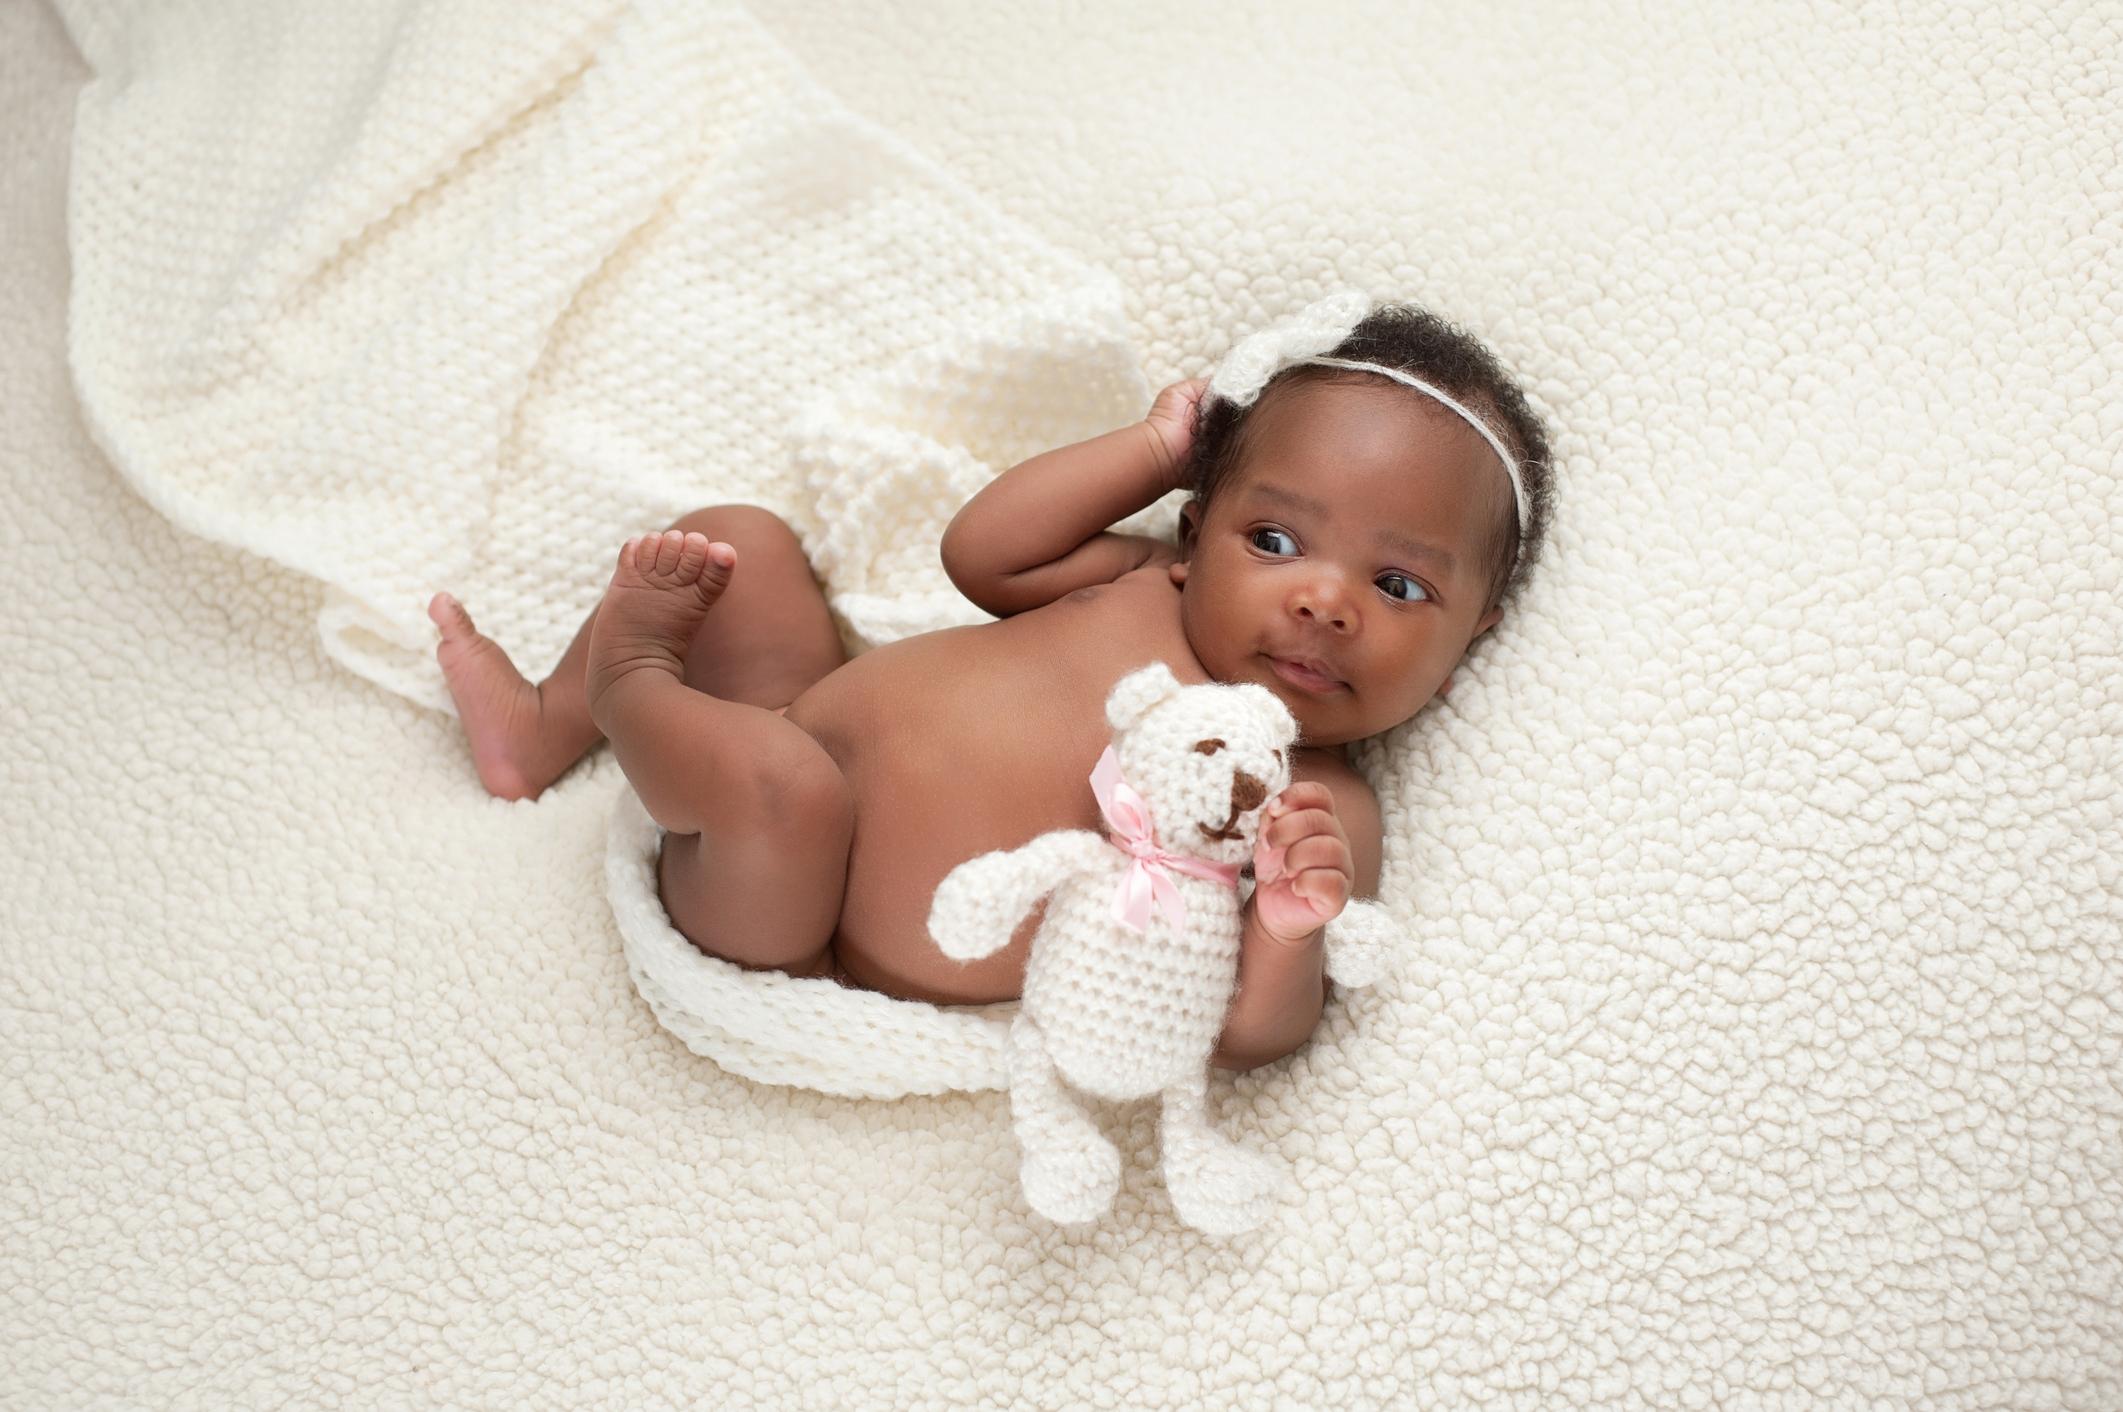 black baby with a teddy bear on a cream background